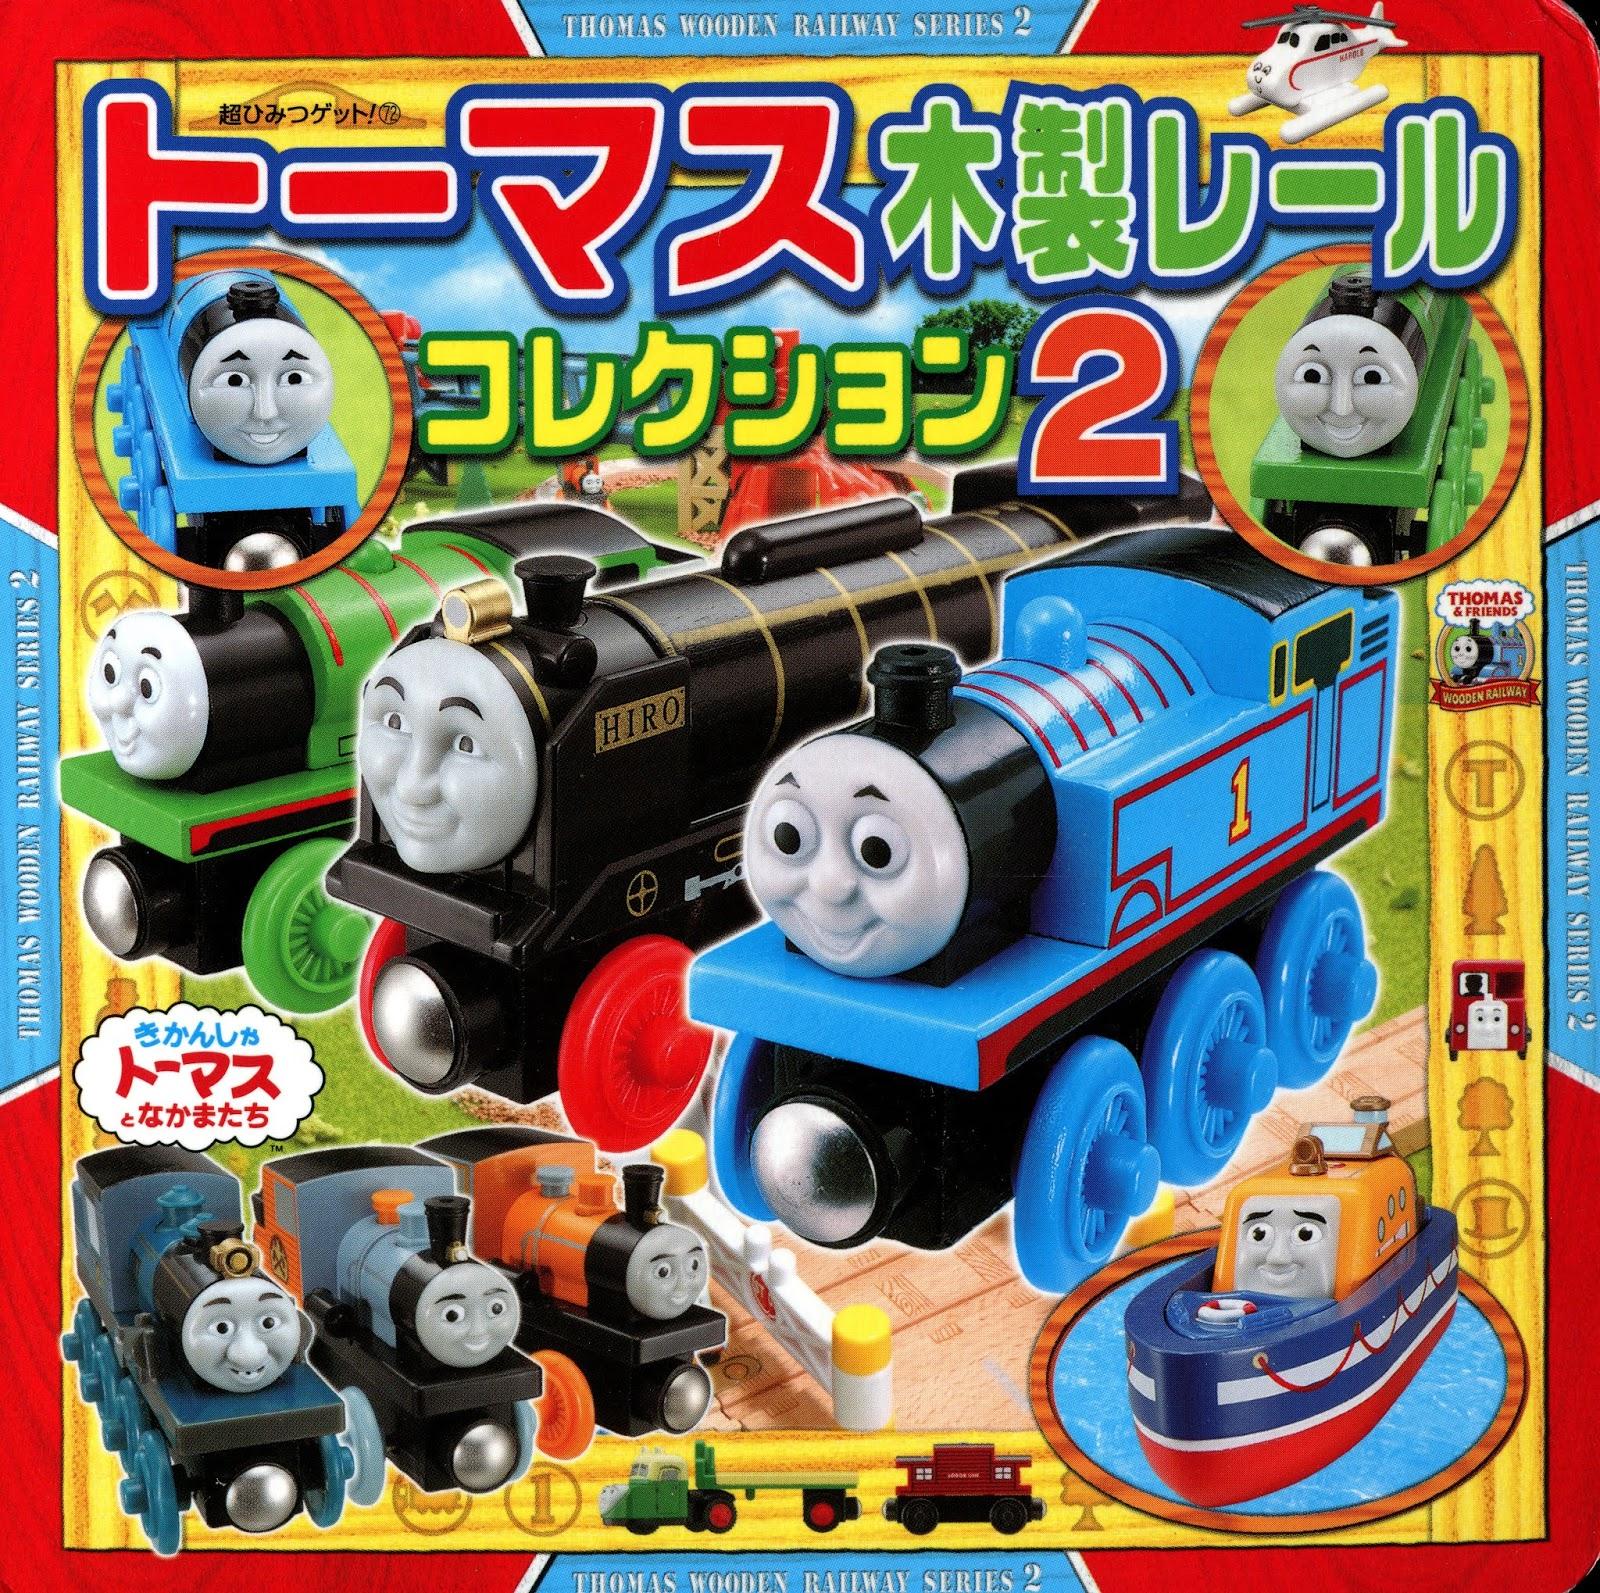 Thomas Wooden Railway Collection 2 Tōmasu Mokusei Korekushon 2